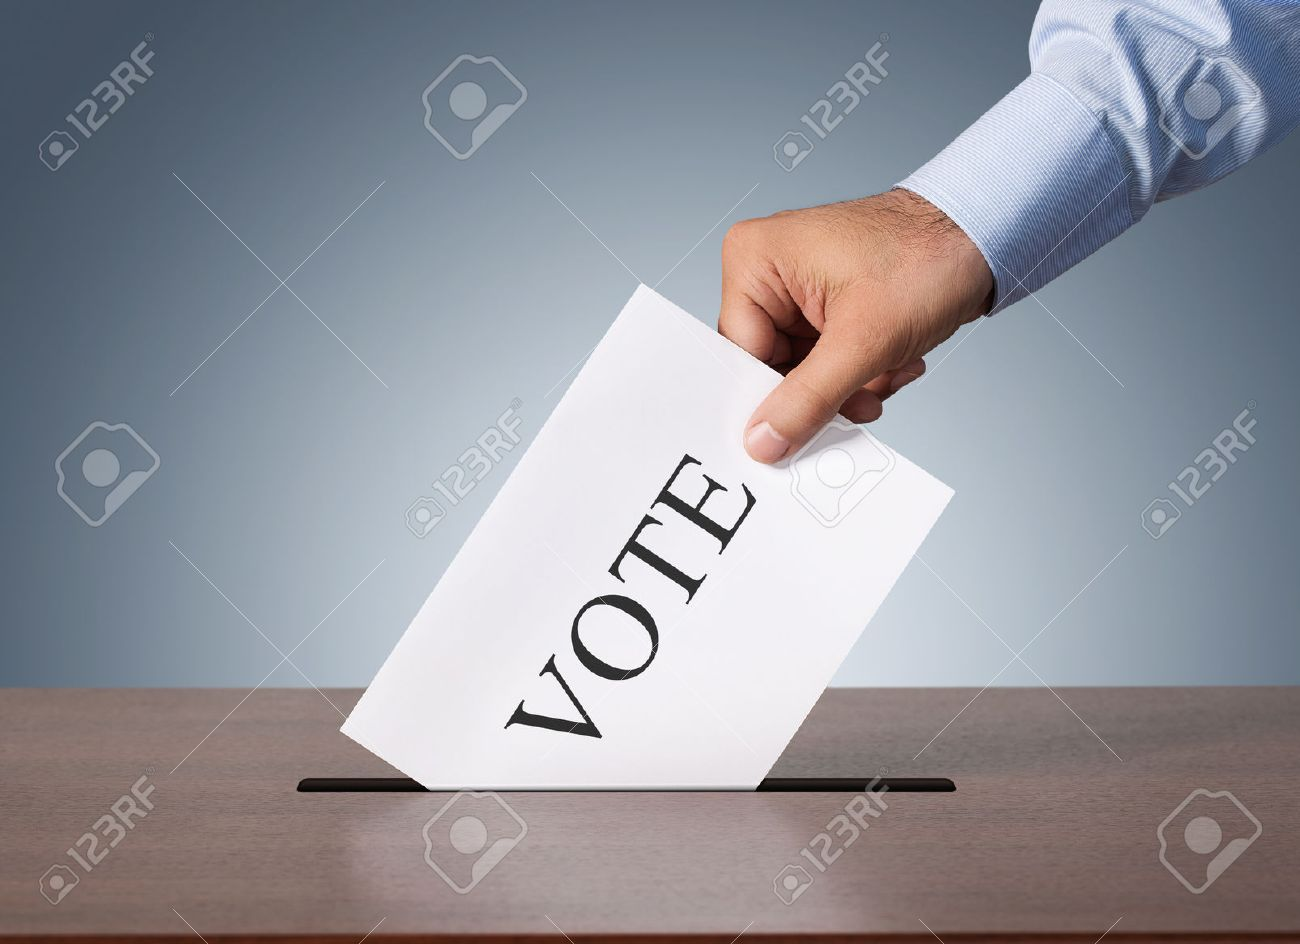 Close up of male hand putting vote into a balot box Standard-Bild - 40283746